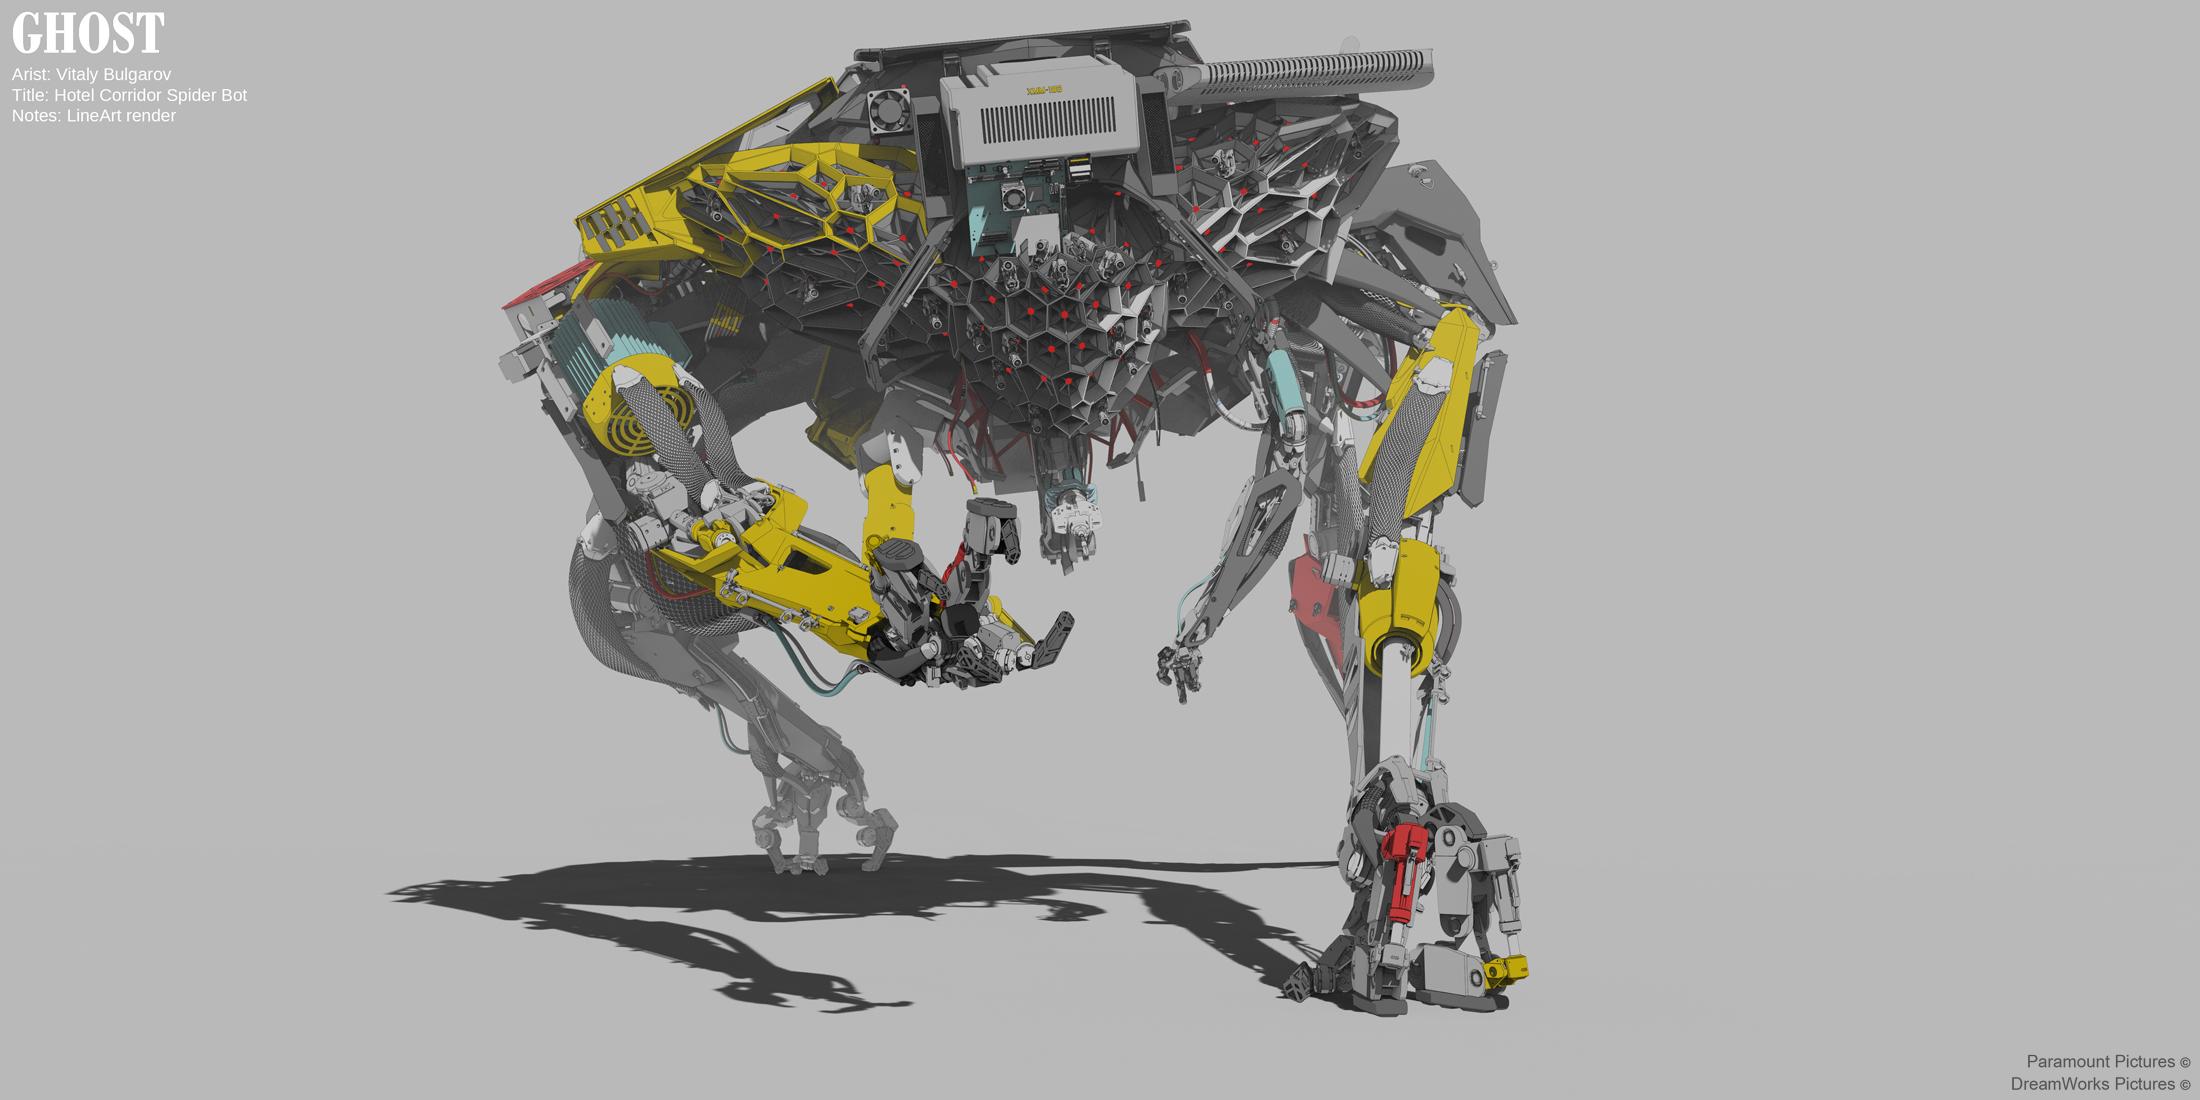 150801_INT_HotelCorridor_VB_SpiderRobot_LineArt_03.jpg